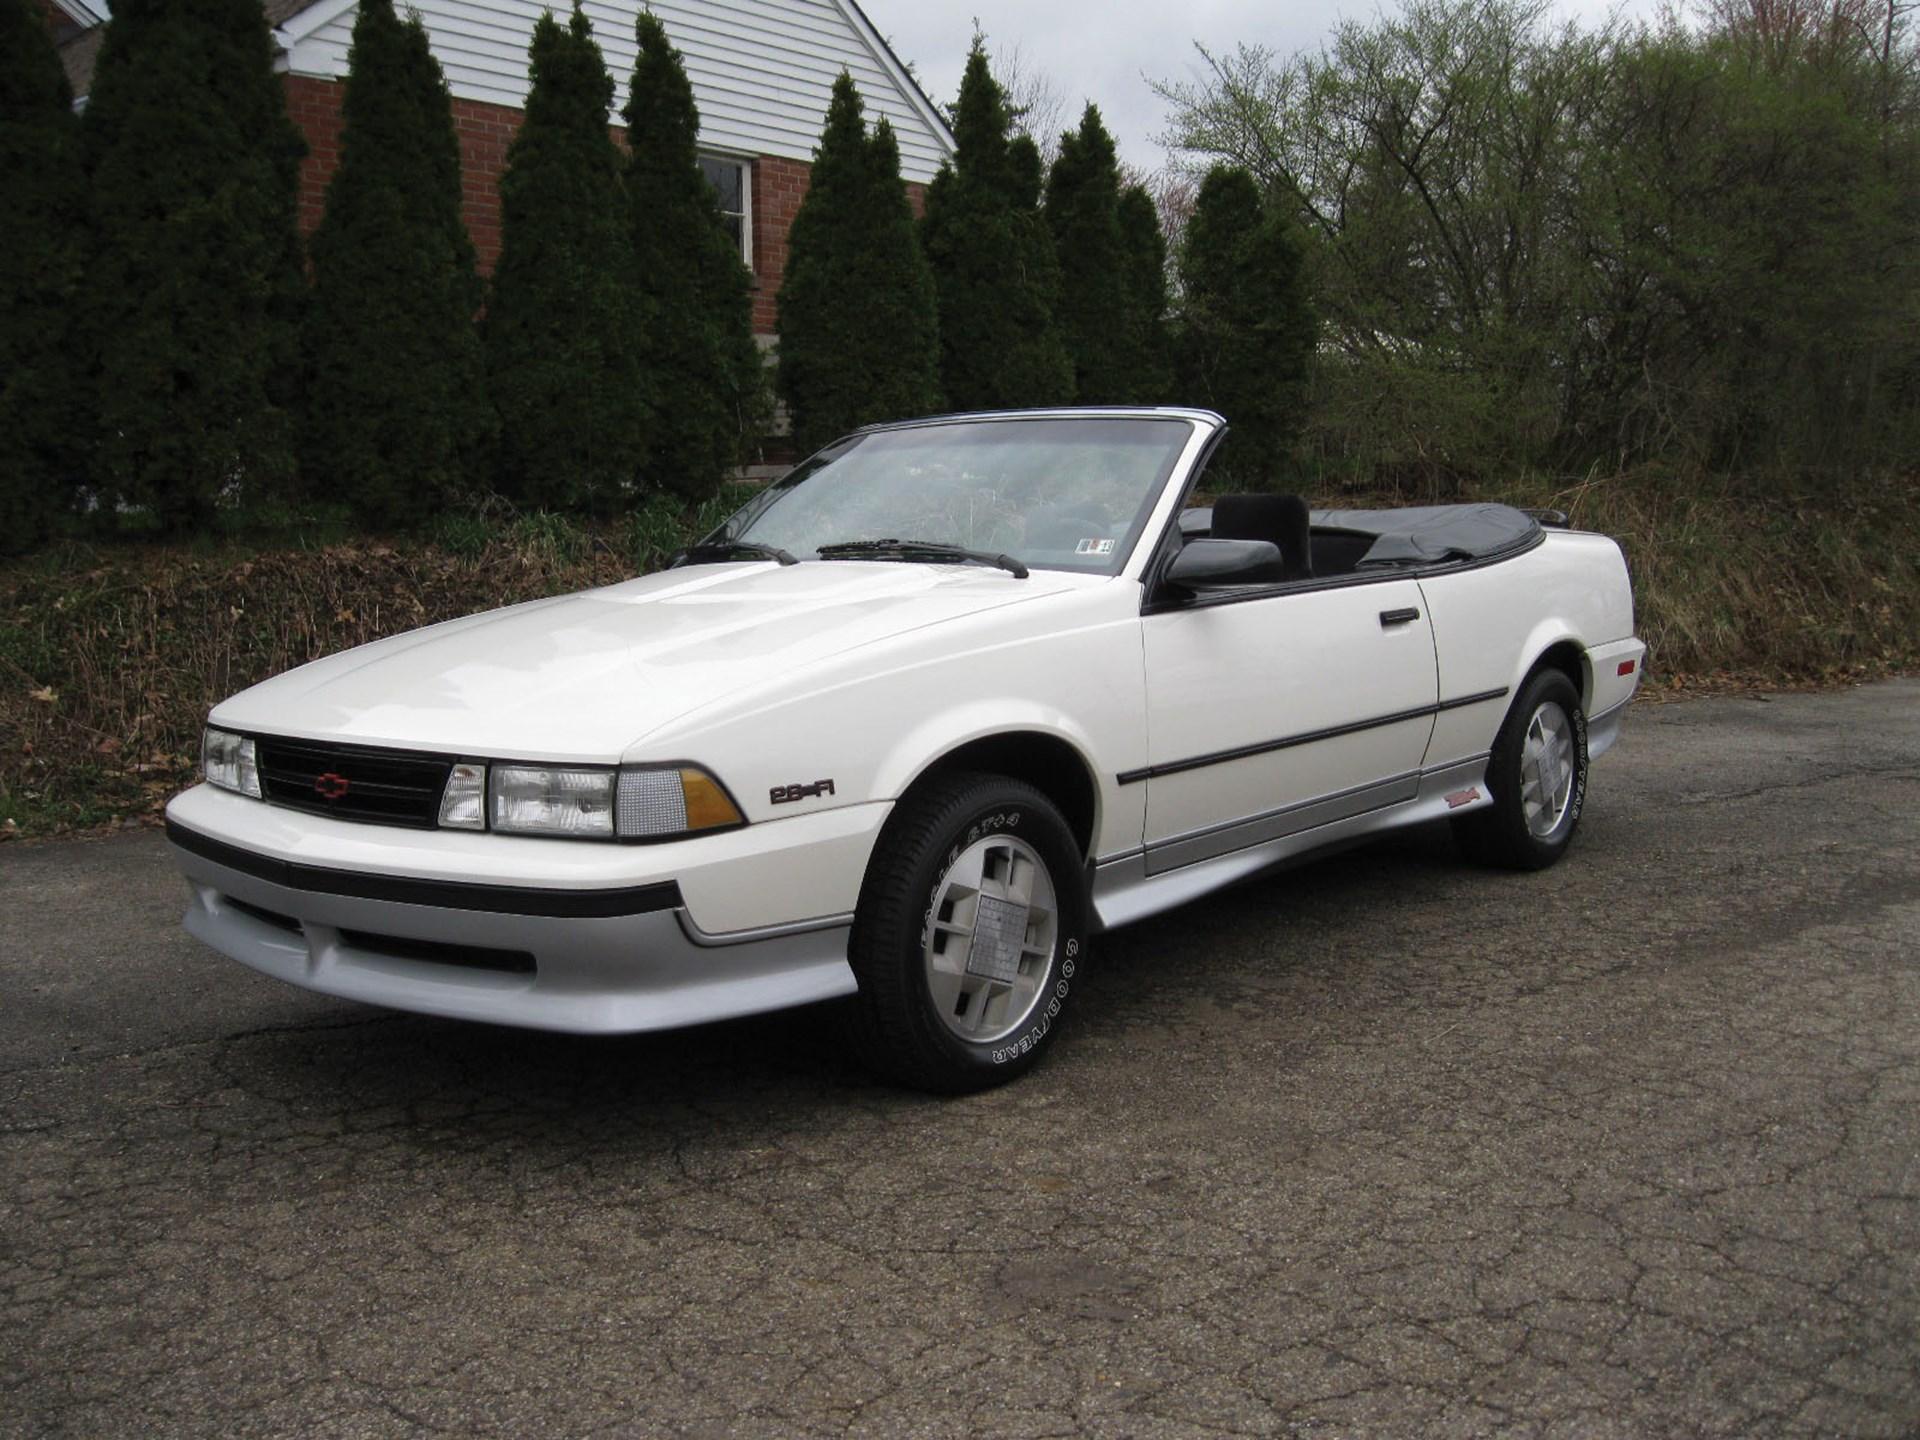 1989 chevy cavalier z24 specs